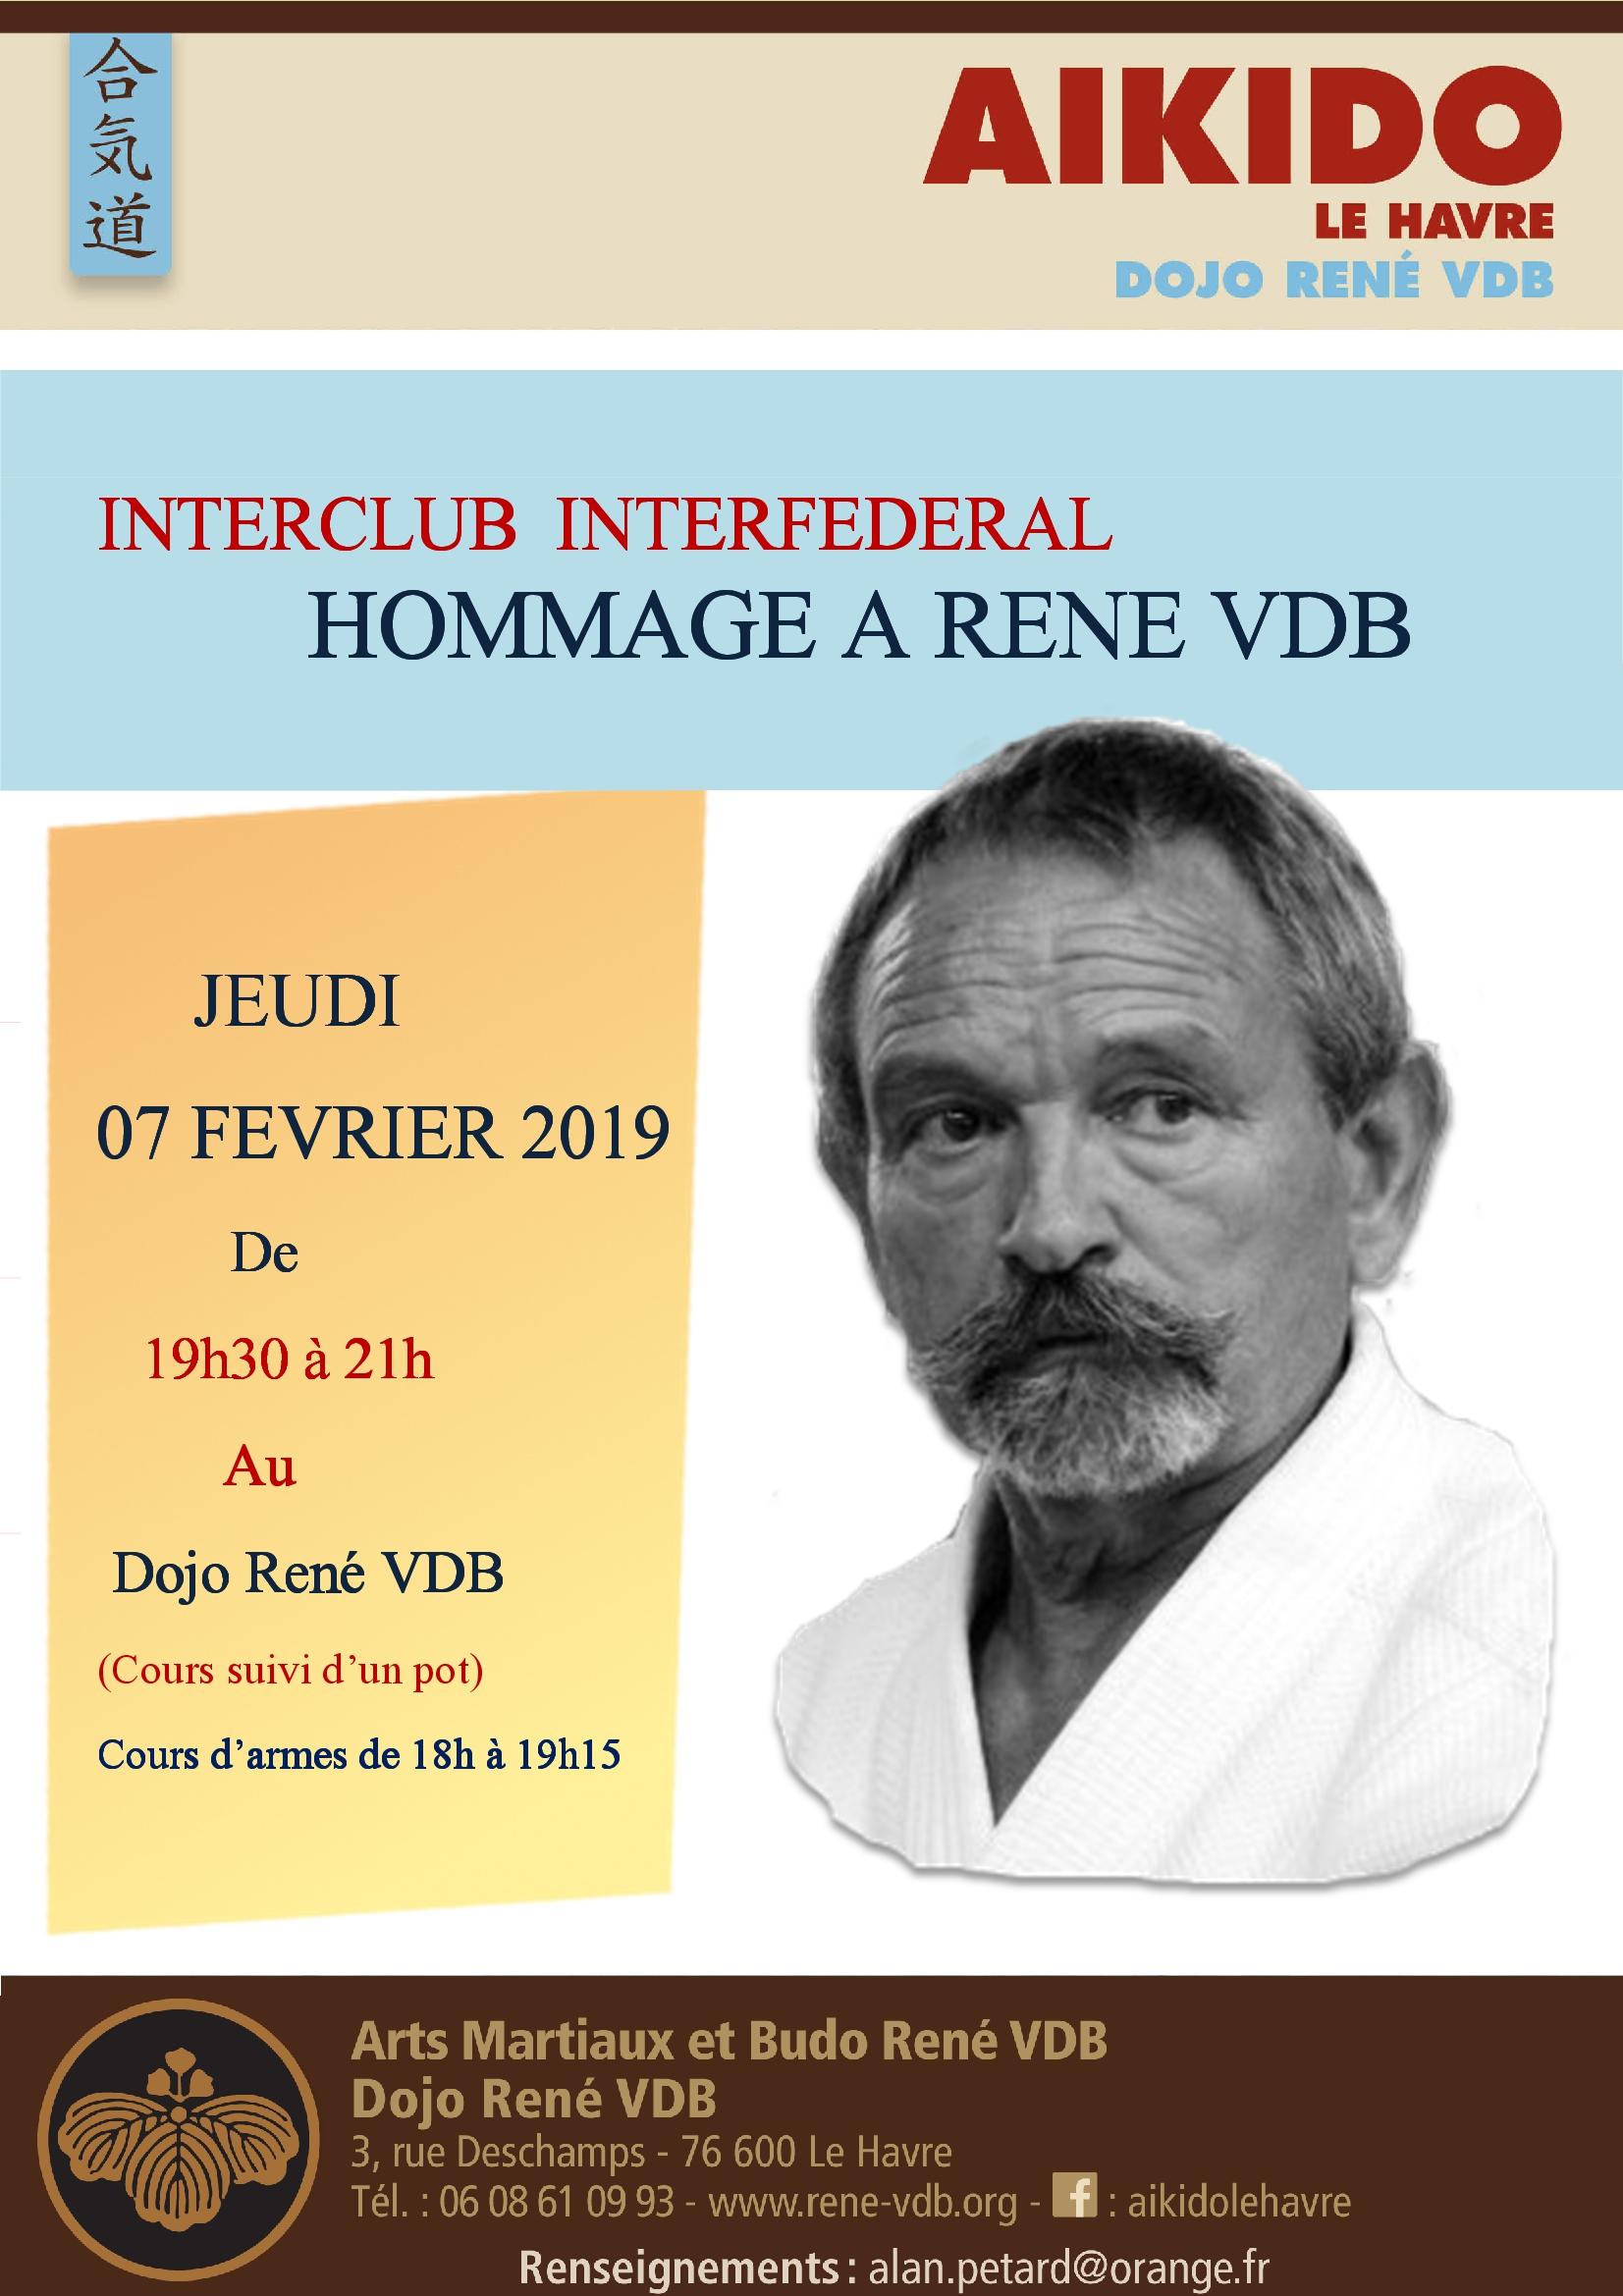 INTERCLUB : HOMMAGE A RENE VDB